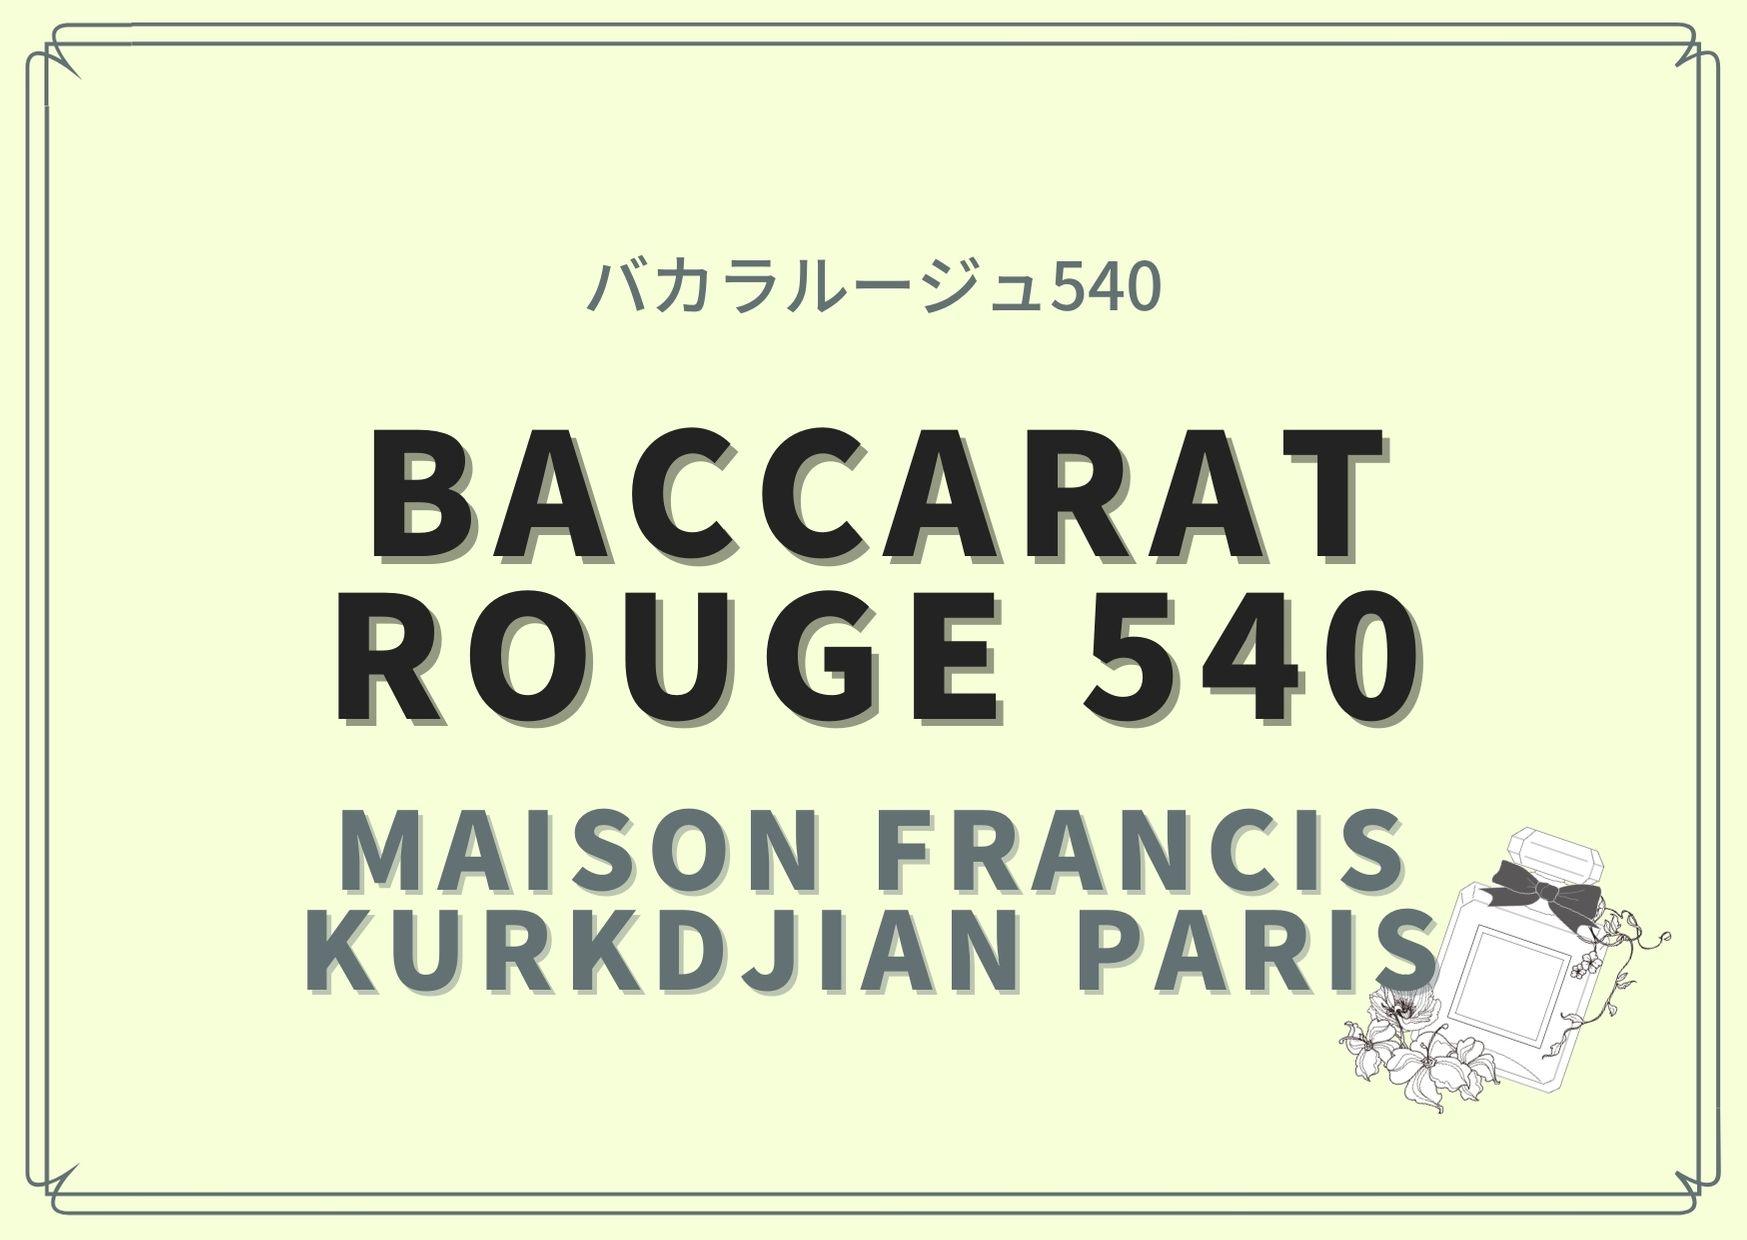 BACCARAT ROUGE 540 (バカラルージュ540) / Maison Francis Kurkdjian Paris(メゾン フランシス クルジャン)